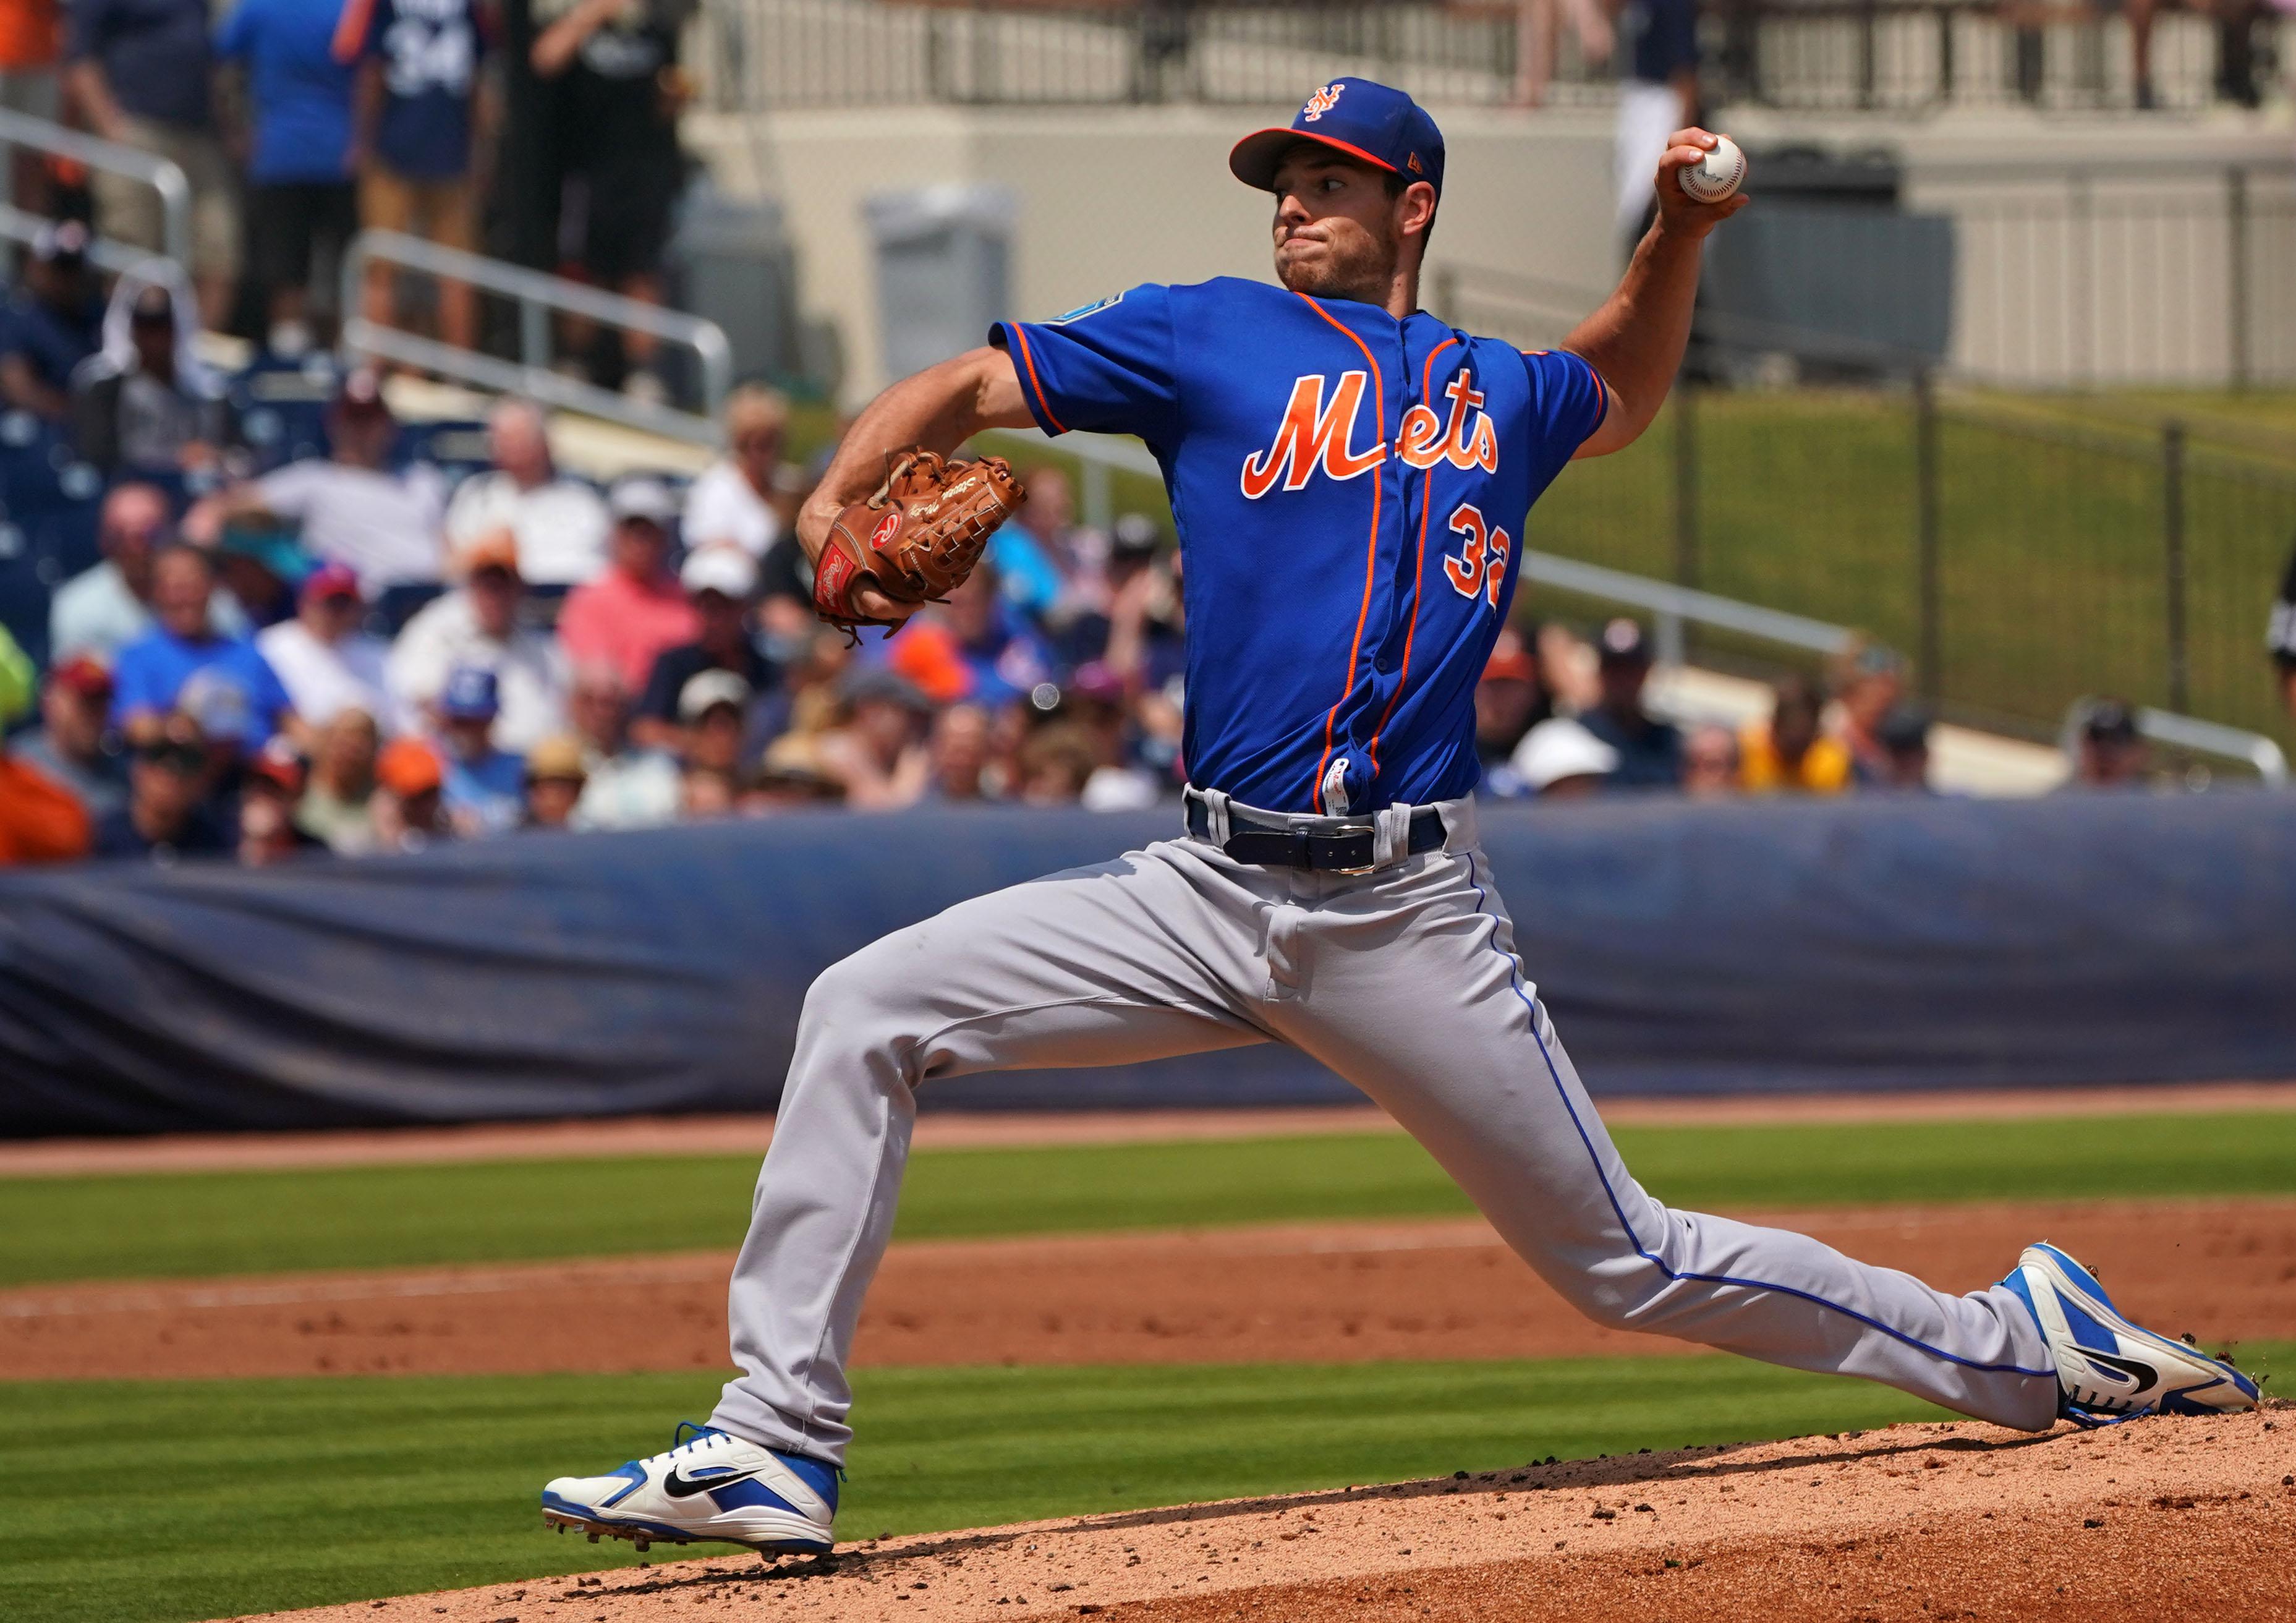 Steven Matz Shines In Latest New York Mets' Exhibition Loss